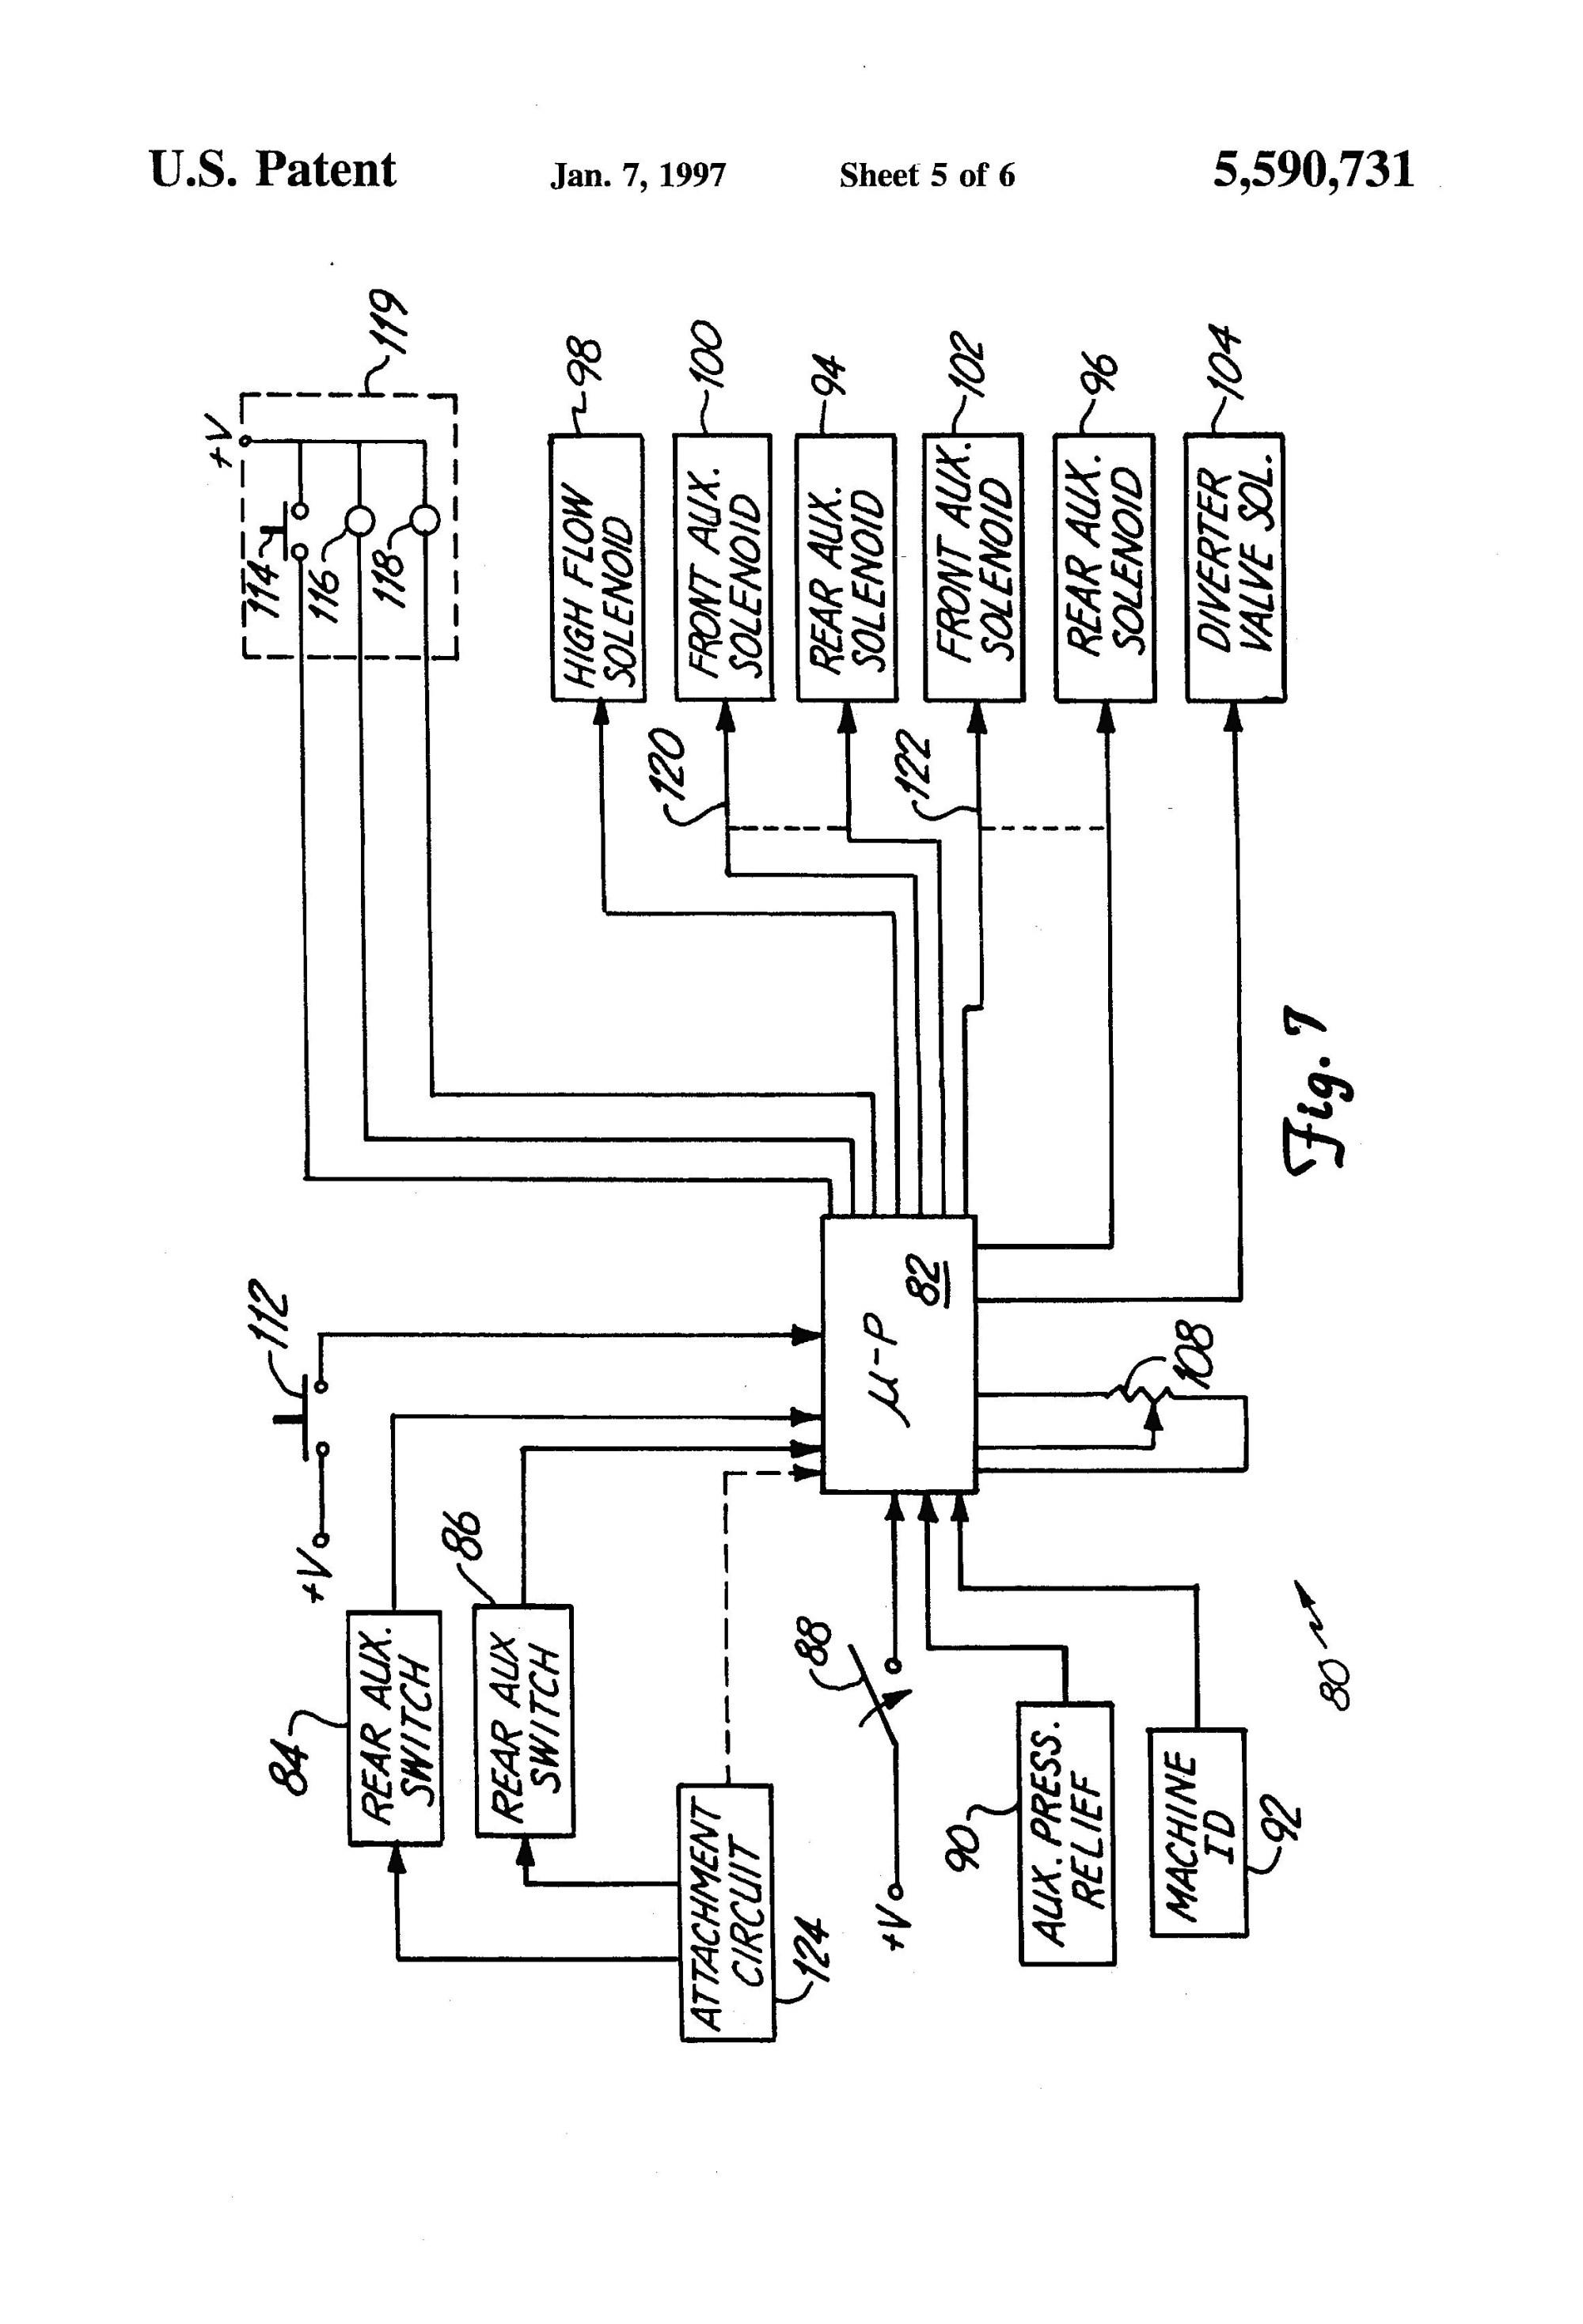 hight resolution of cummins fuel shut f solenoid wiring diagram new mac solenoid valve wiring diagram electrical work wiring